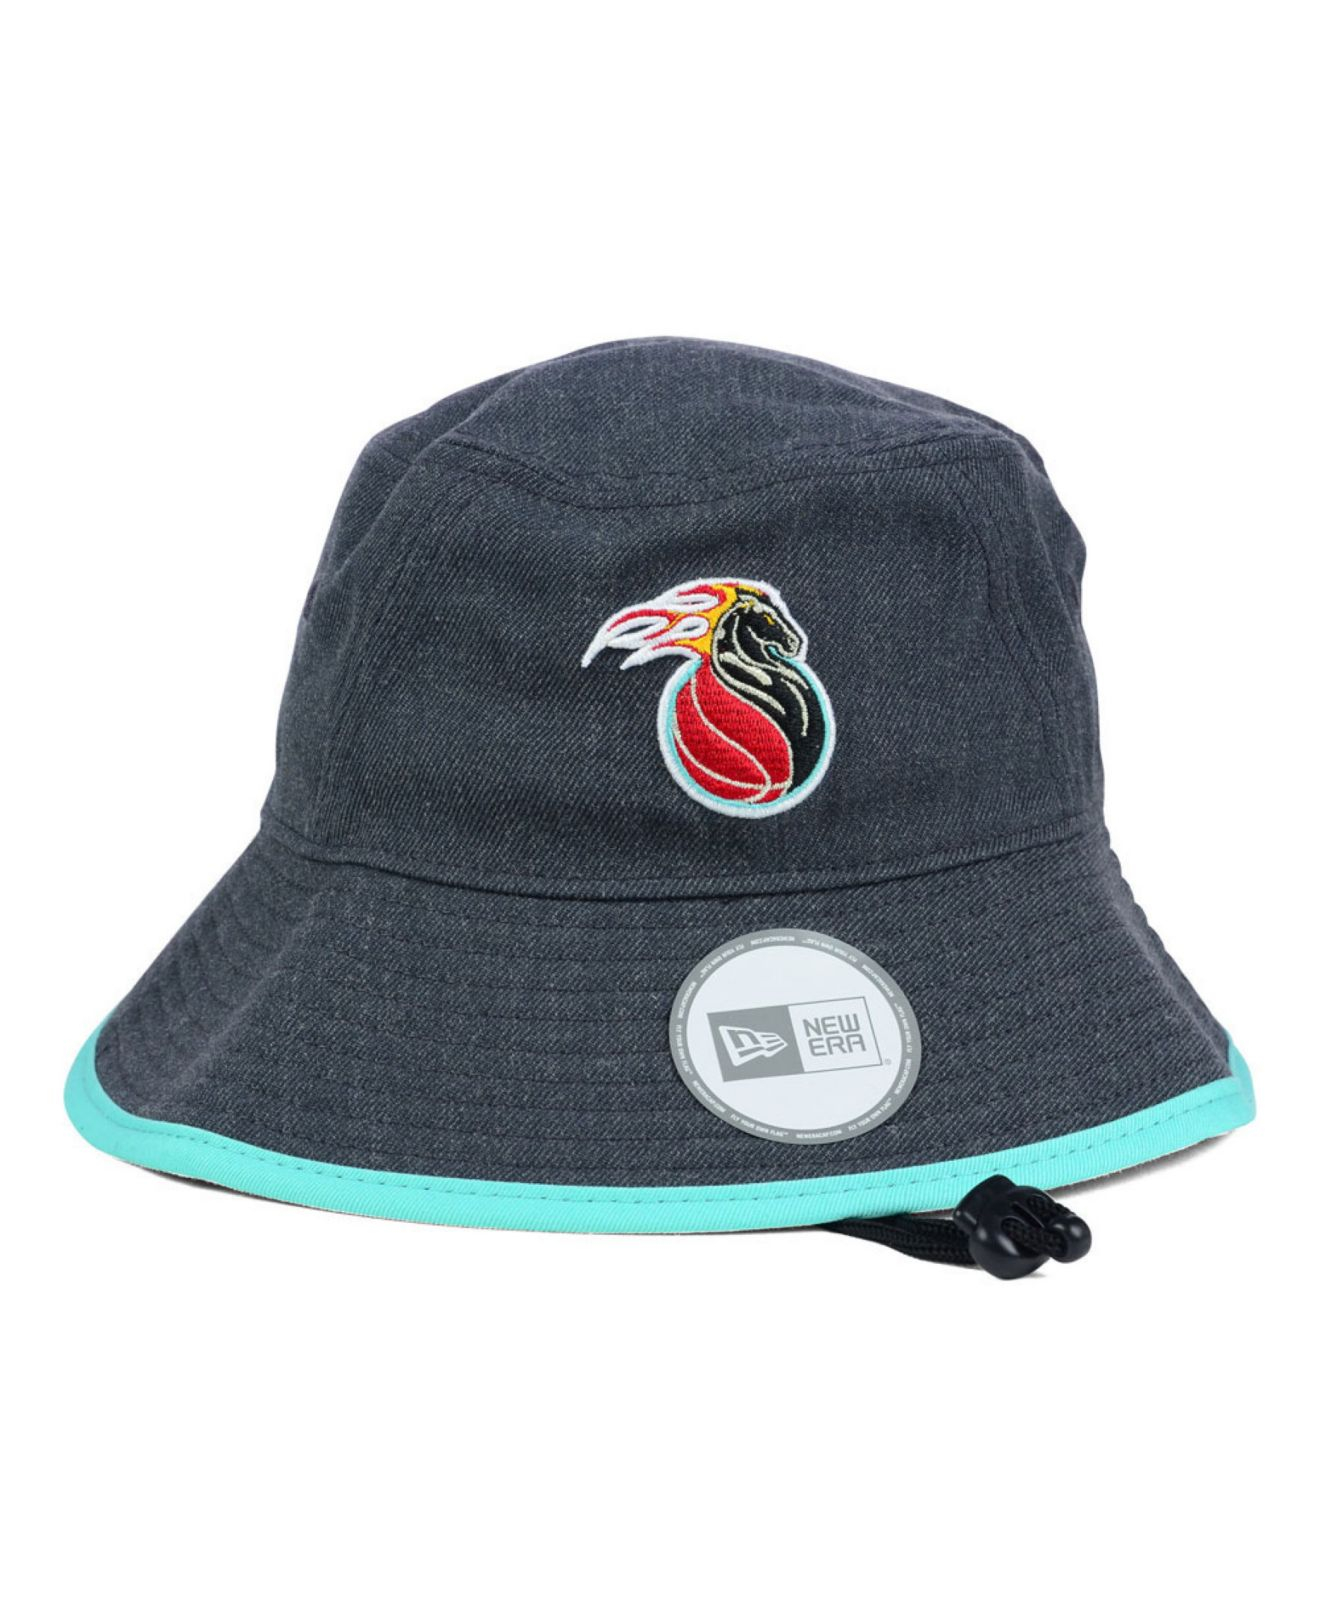 956347f5ac4 ... shop lyst ktz detroit pistons dark heather tipped bucket hat in gray  26205 e921f